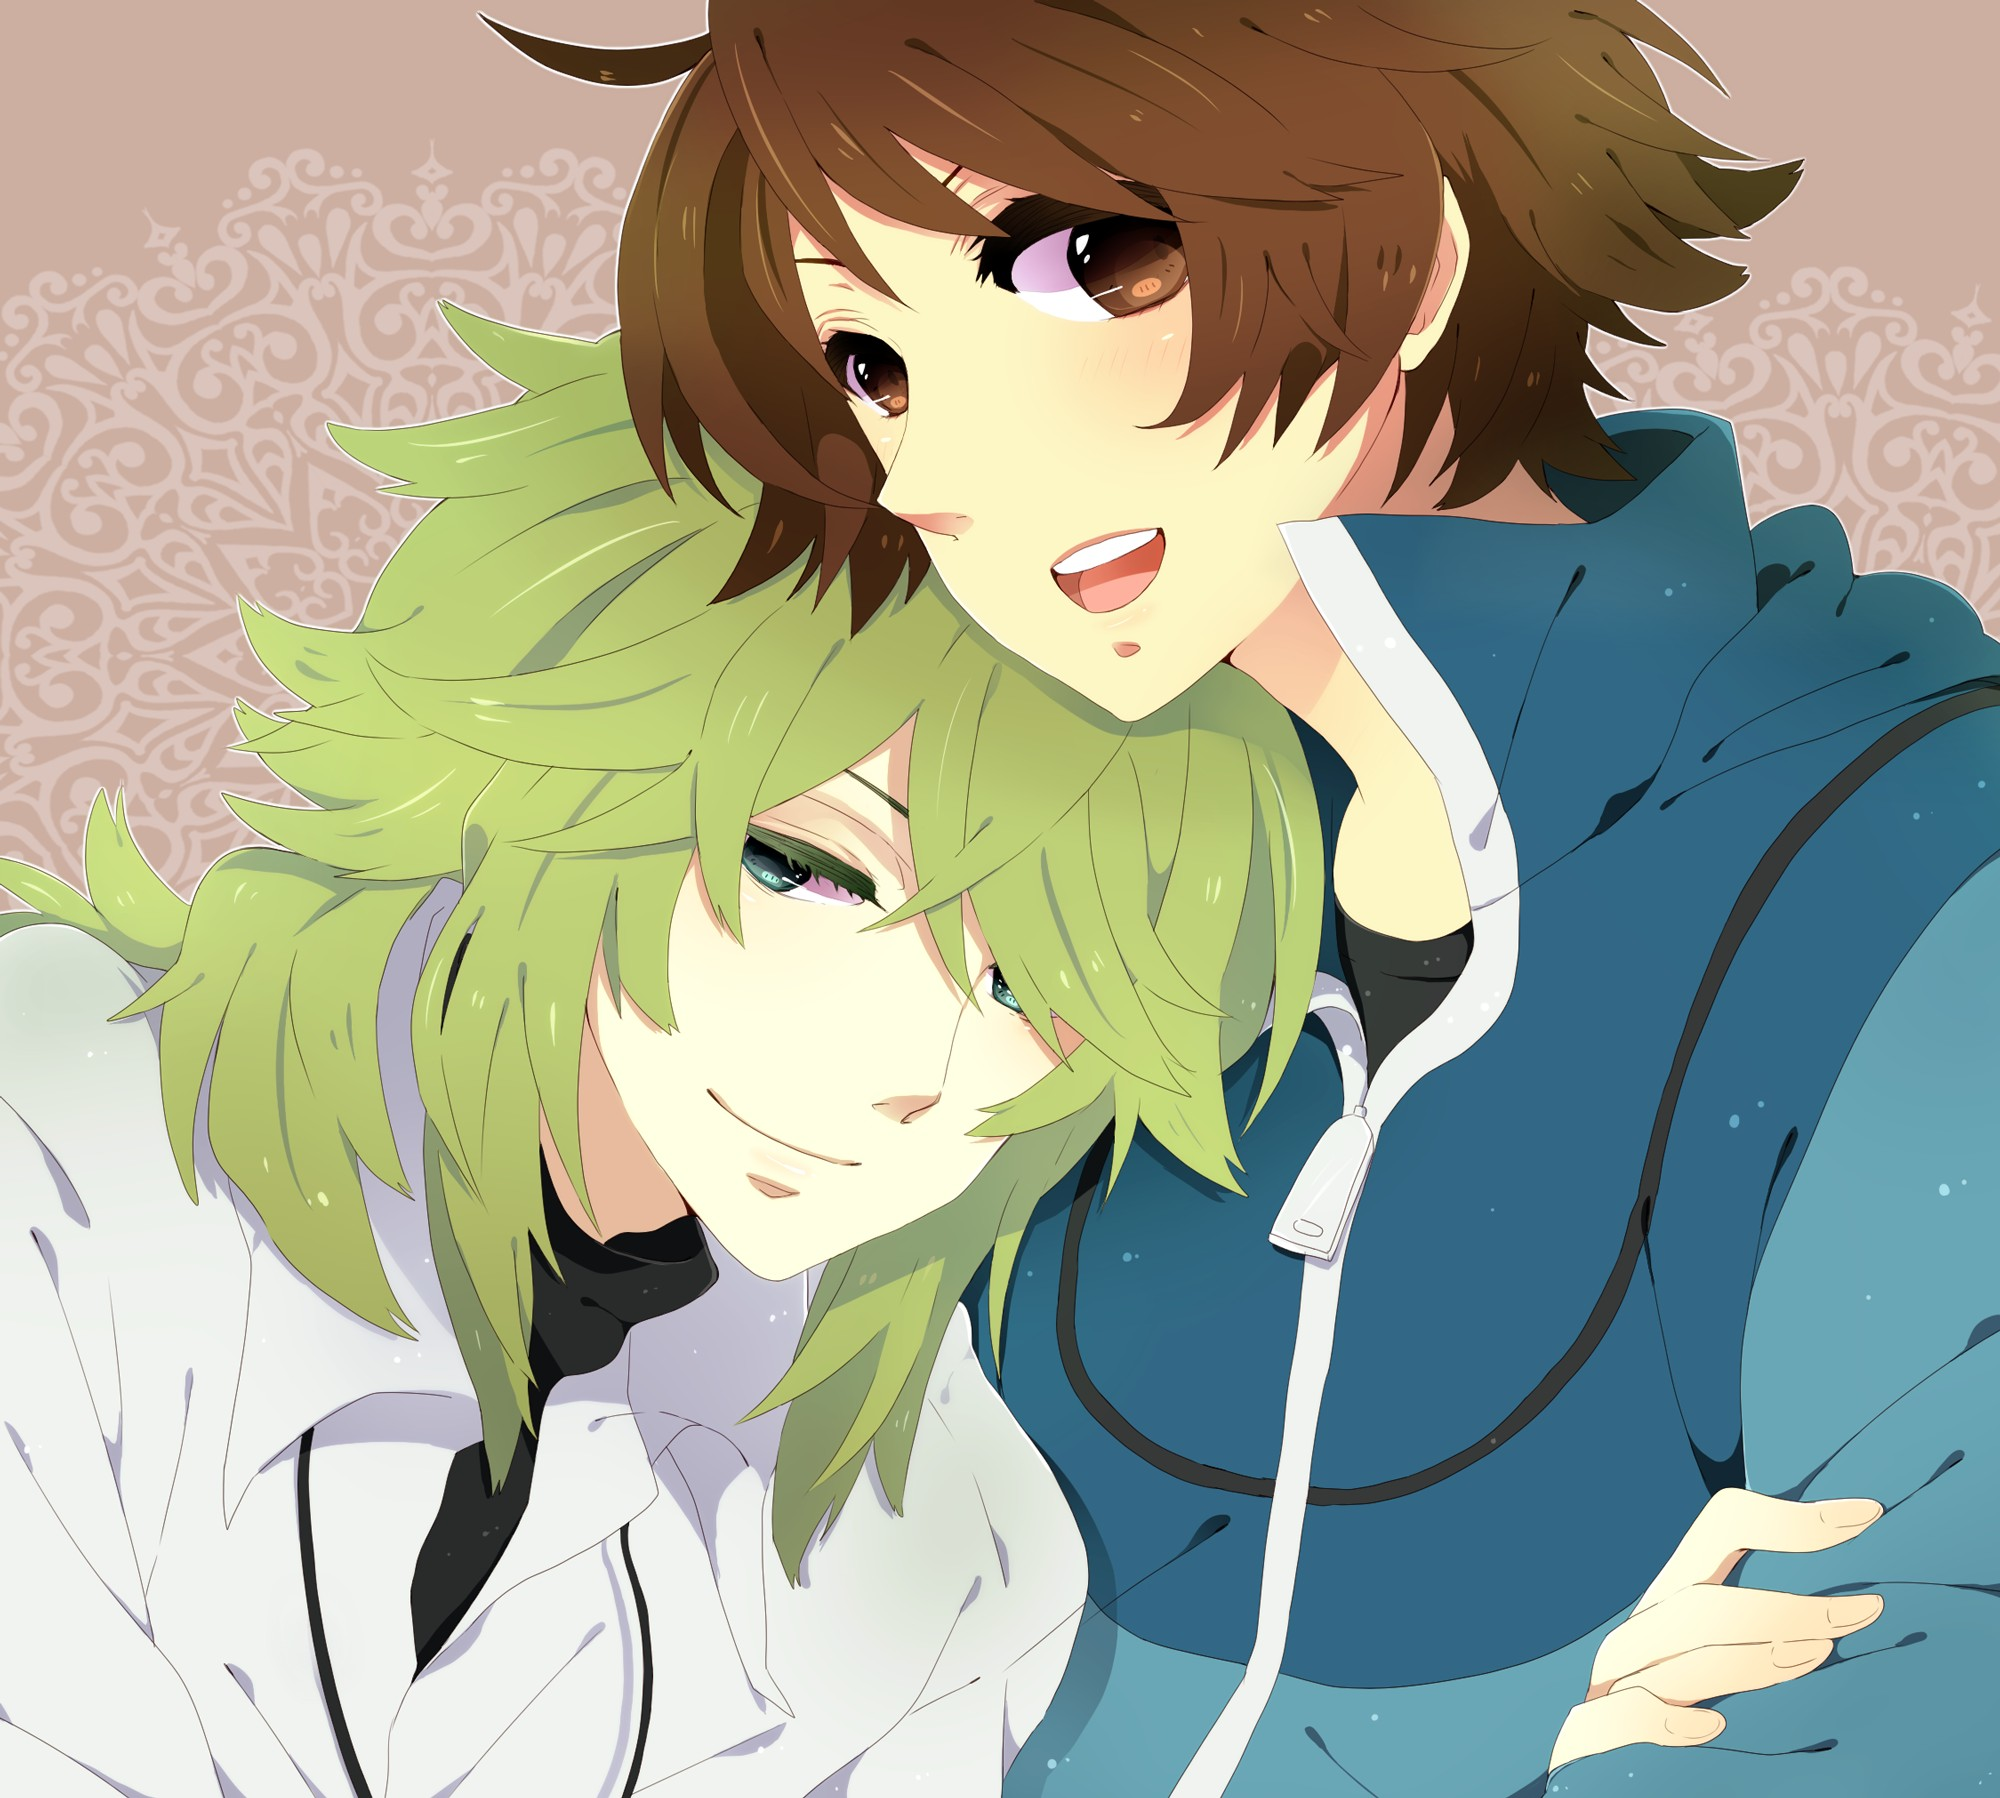 Tags anime sako u pokémon black white pokémon n